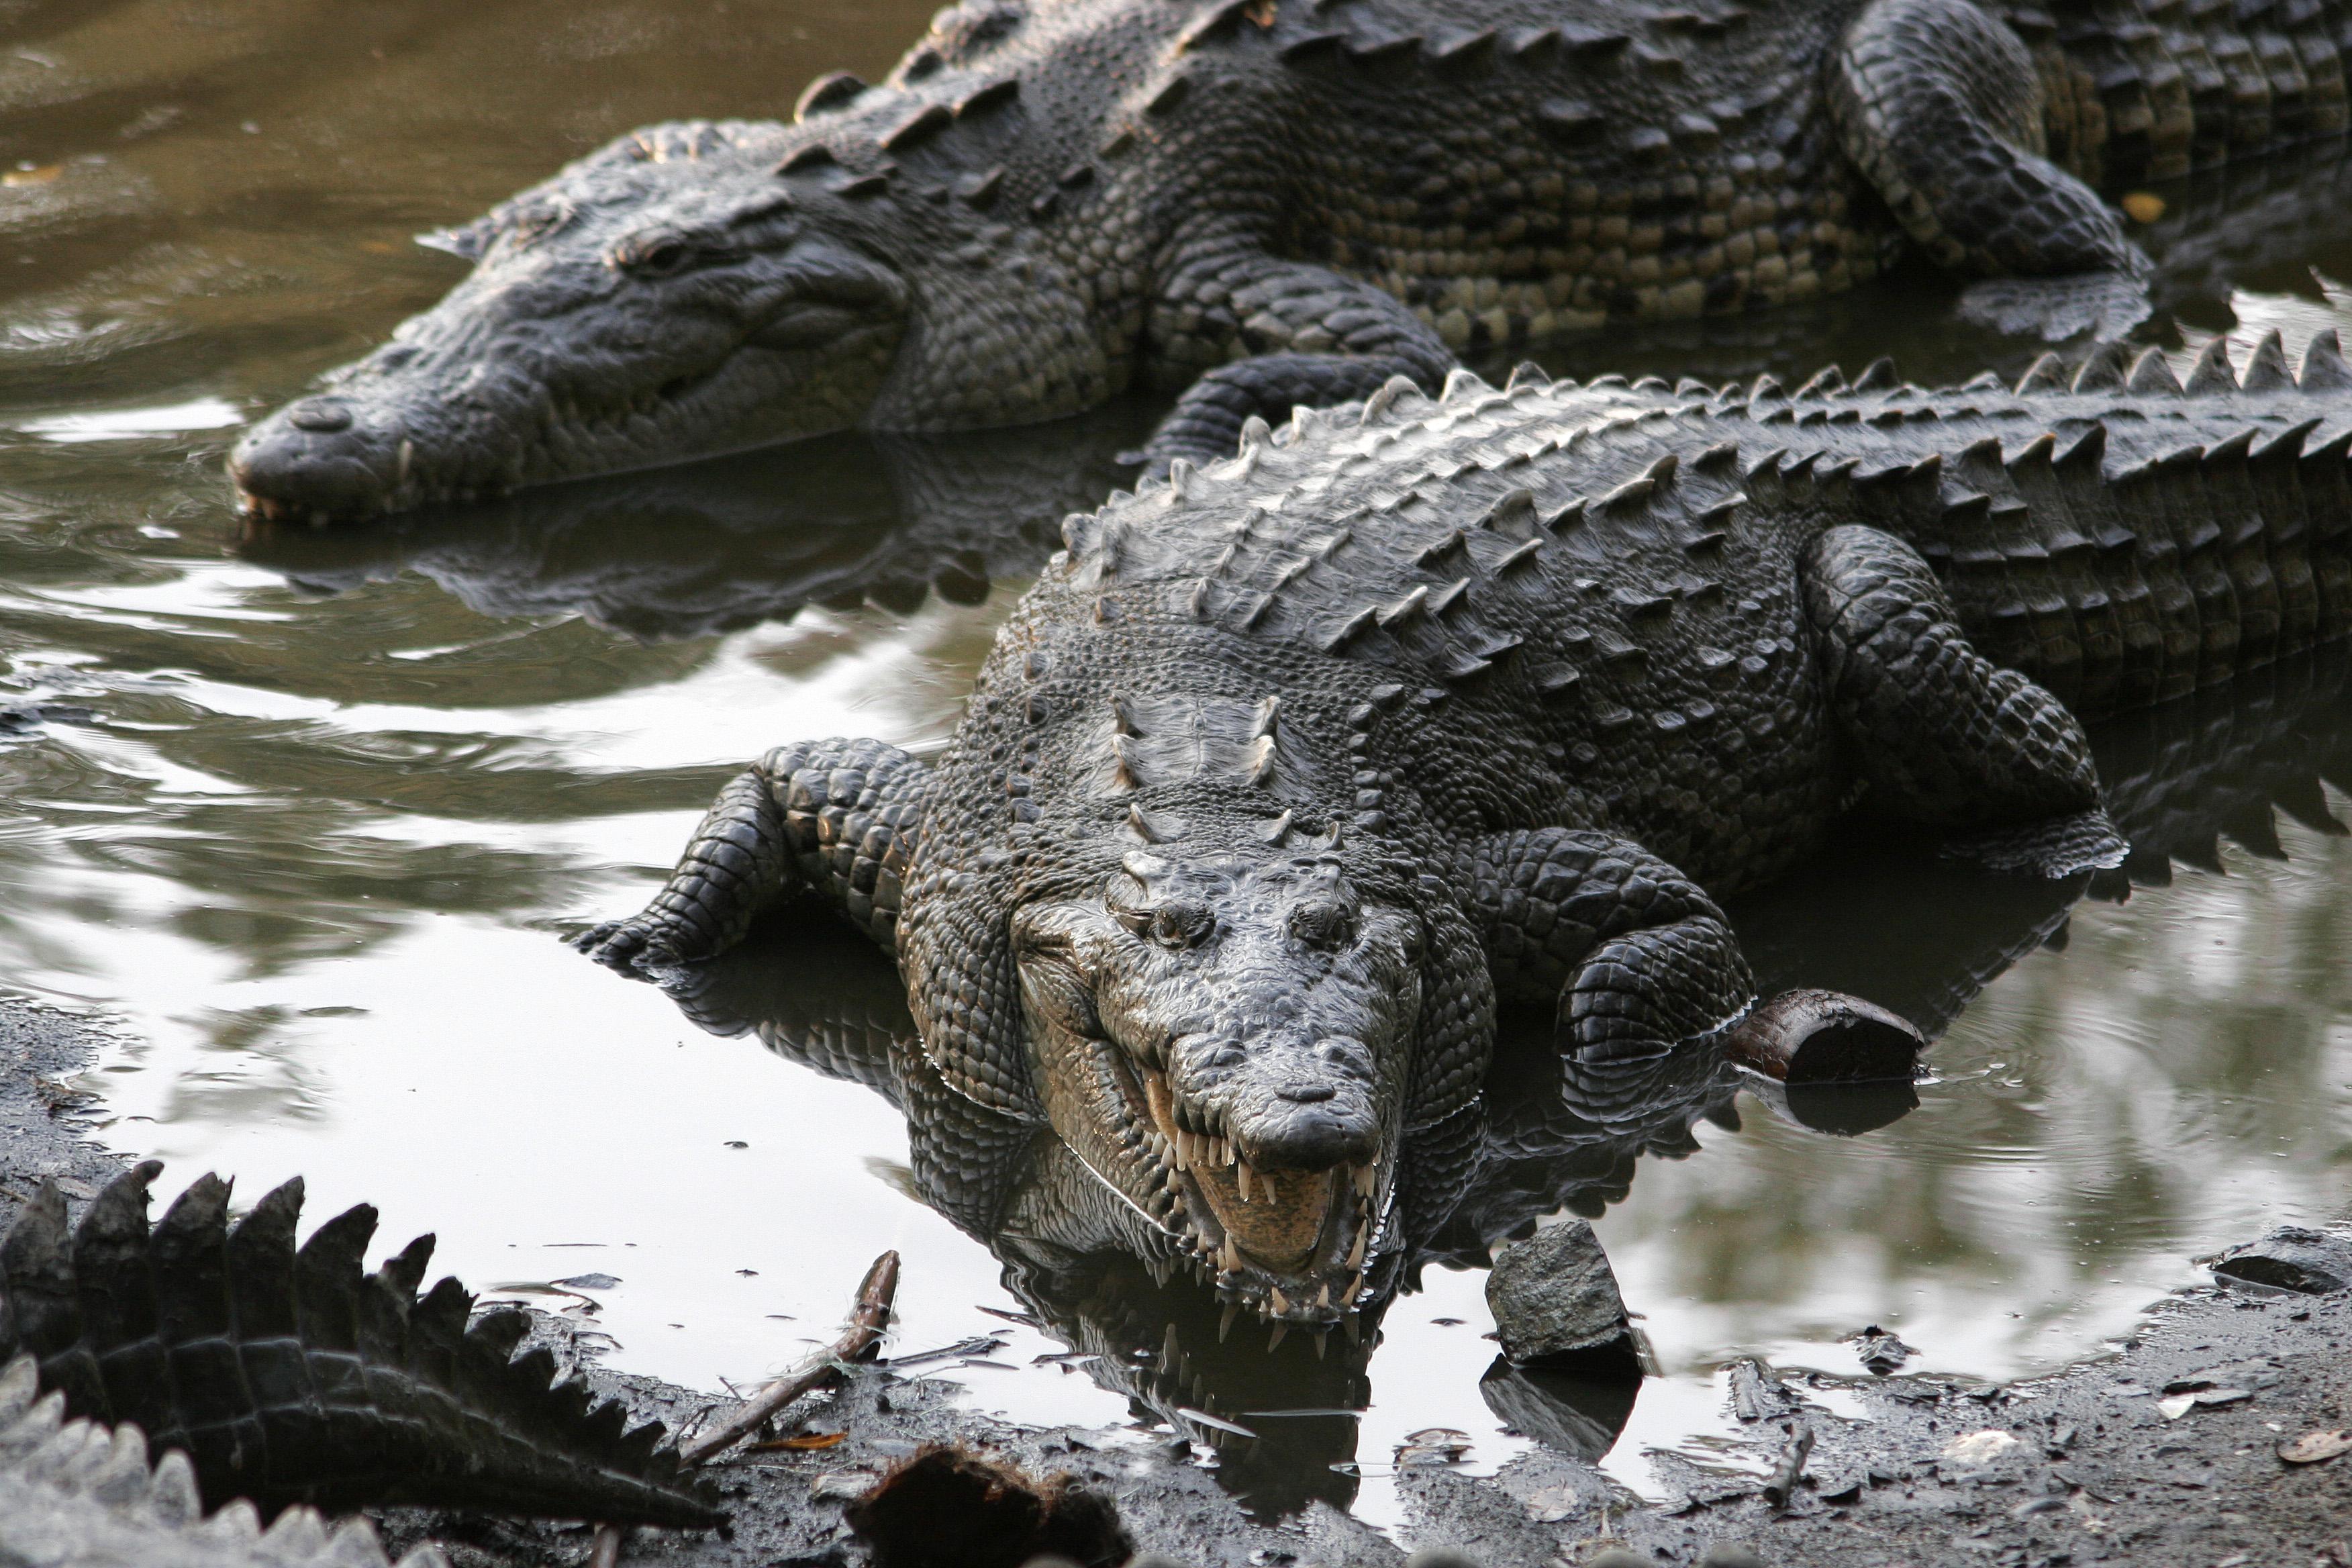 20160606_crocodylus_acutus_jalisco_mexico